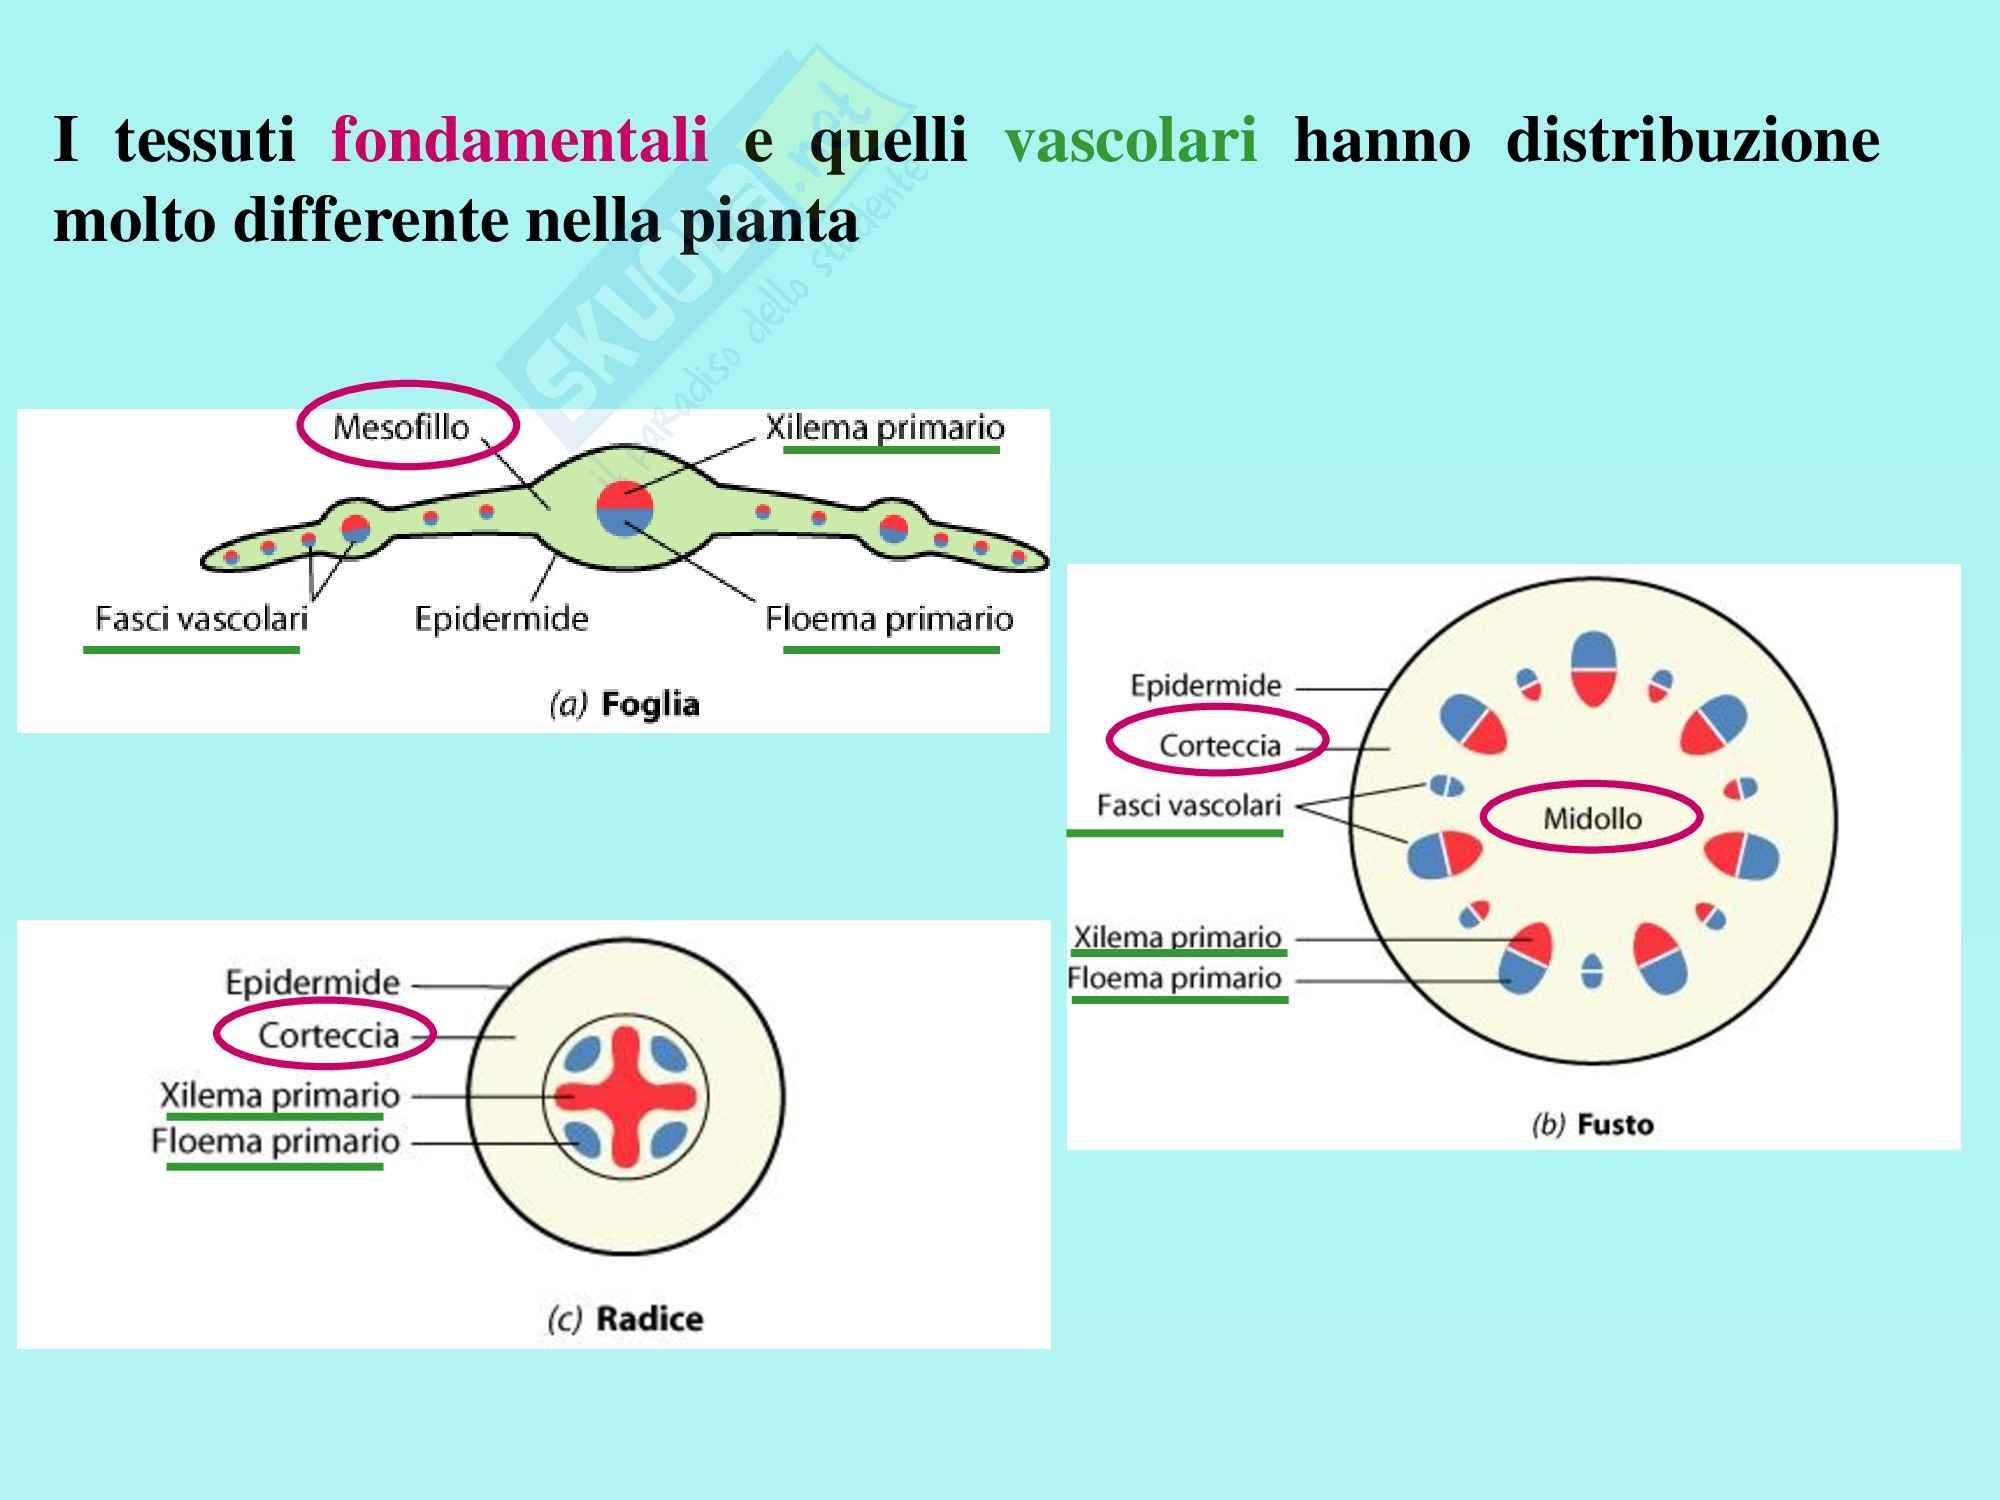 Biologia vegetale - tessuti fondamentali e vascolari Pag. 2